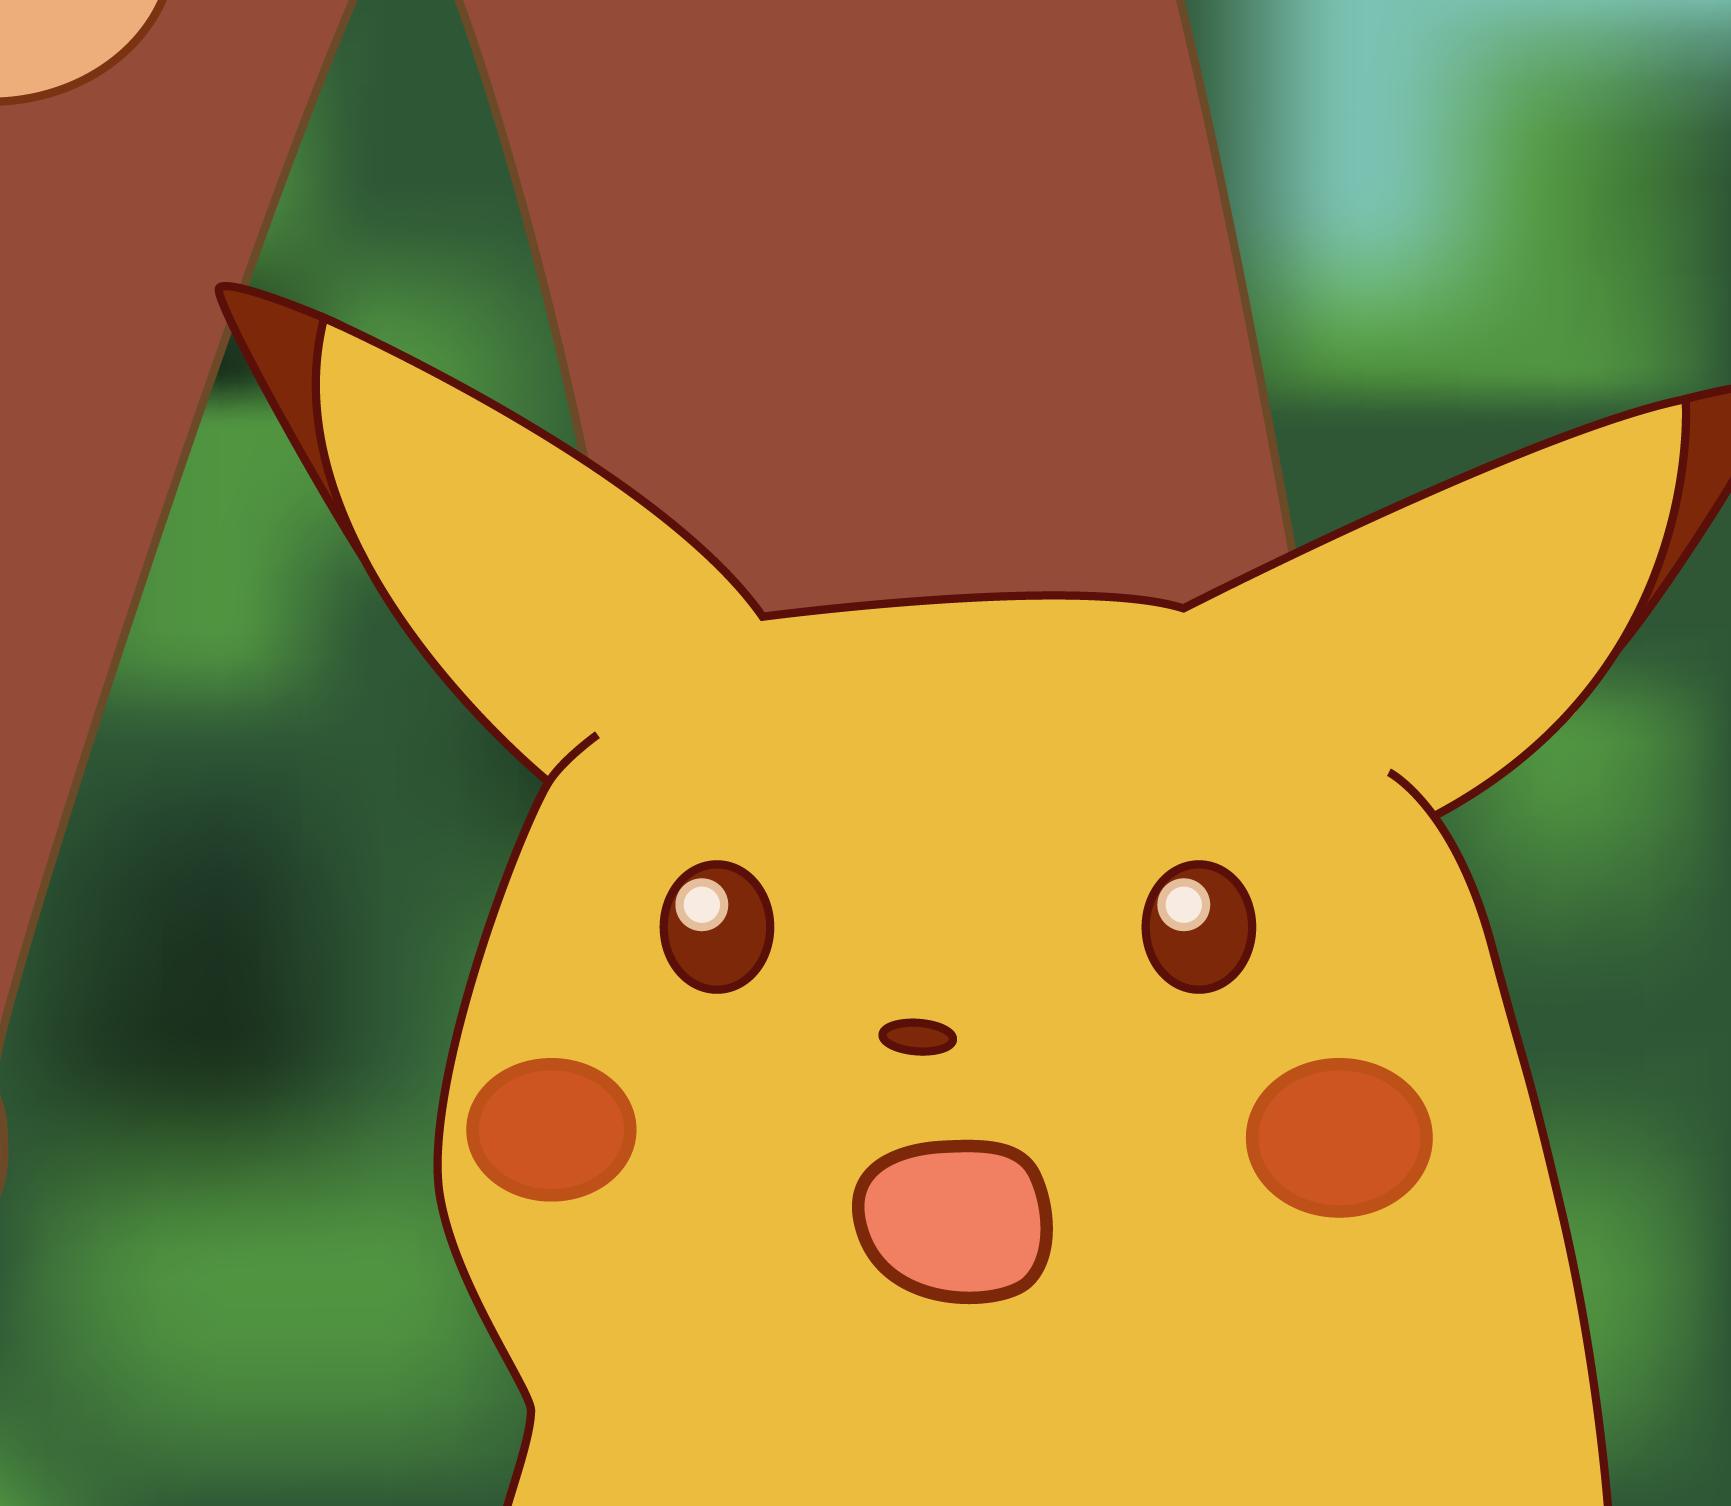 Hd Version Surprised Pikachu Know Your Meme Pikachu Memes Funny Marvel Memes Marvel Memes